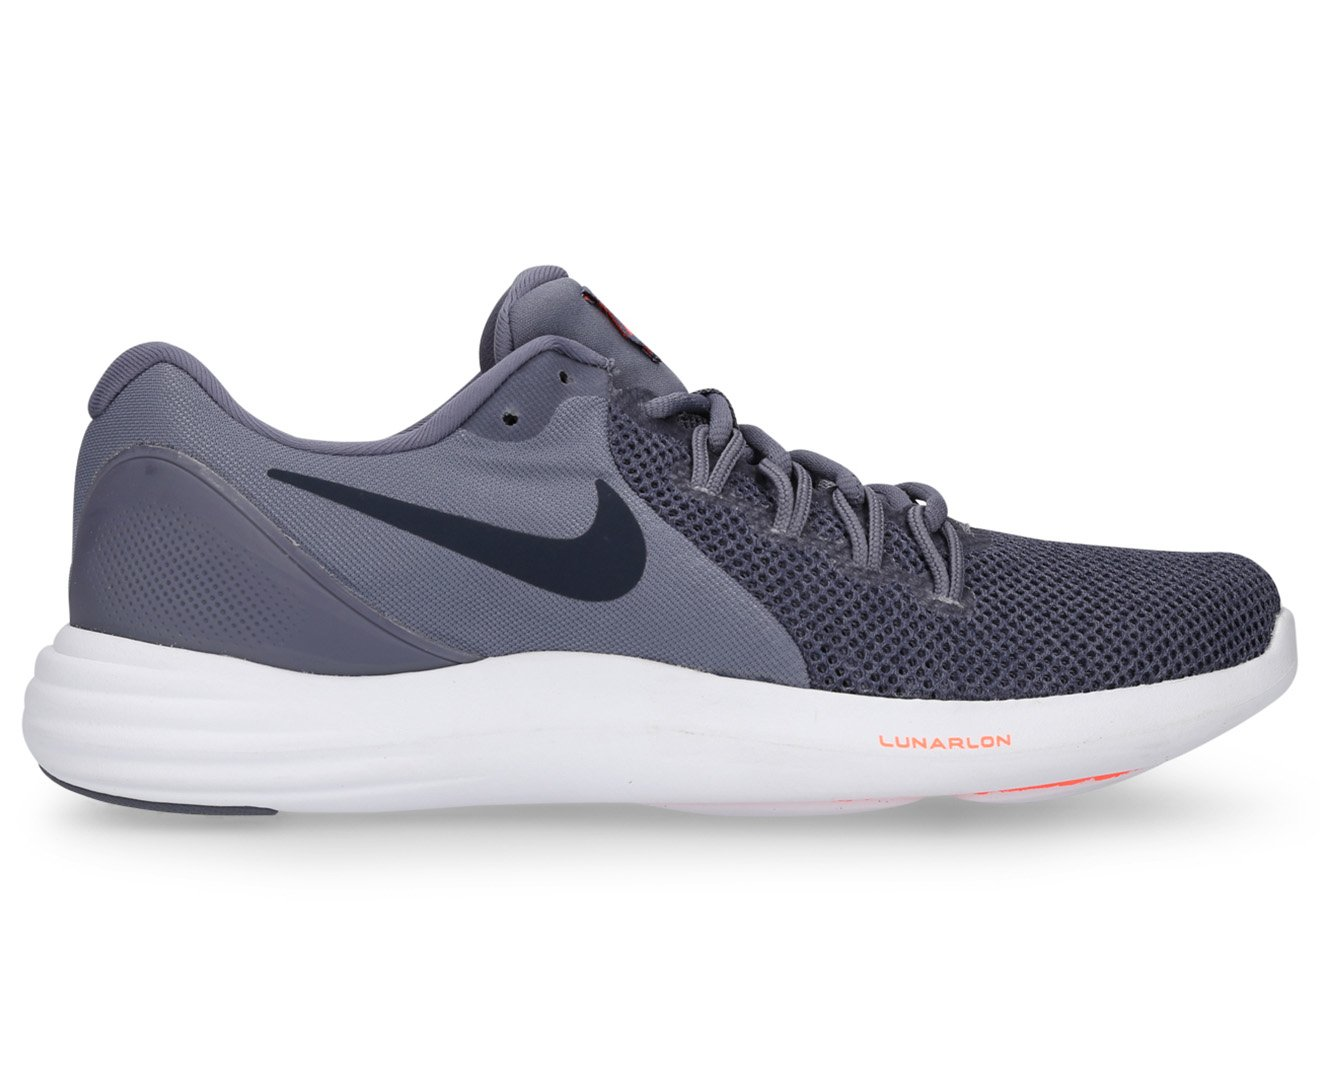 5215554ac888 Galleon - Nike Lunar Apparent Mens Running Shoes (10 M US